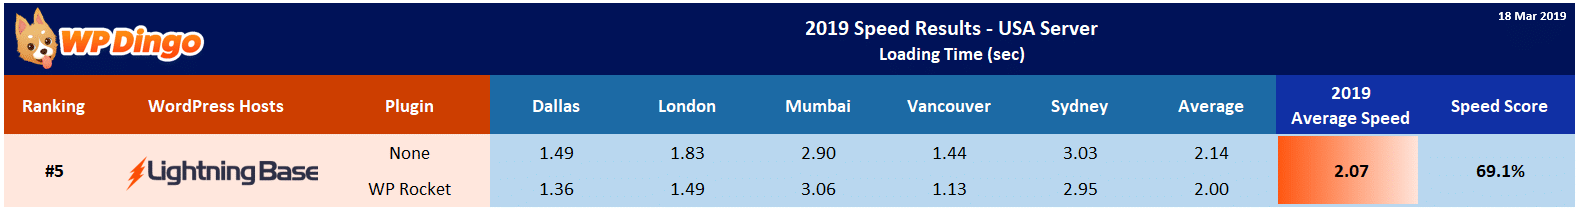 2019 Lightning Base Speed Table - USA Server